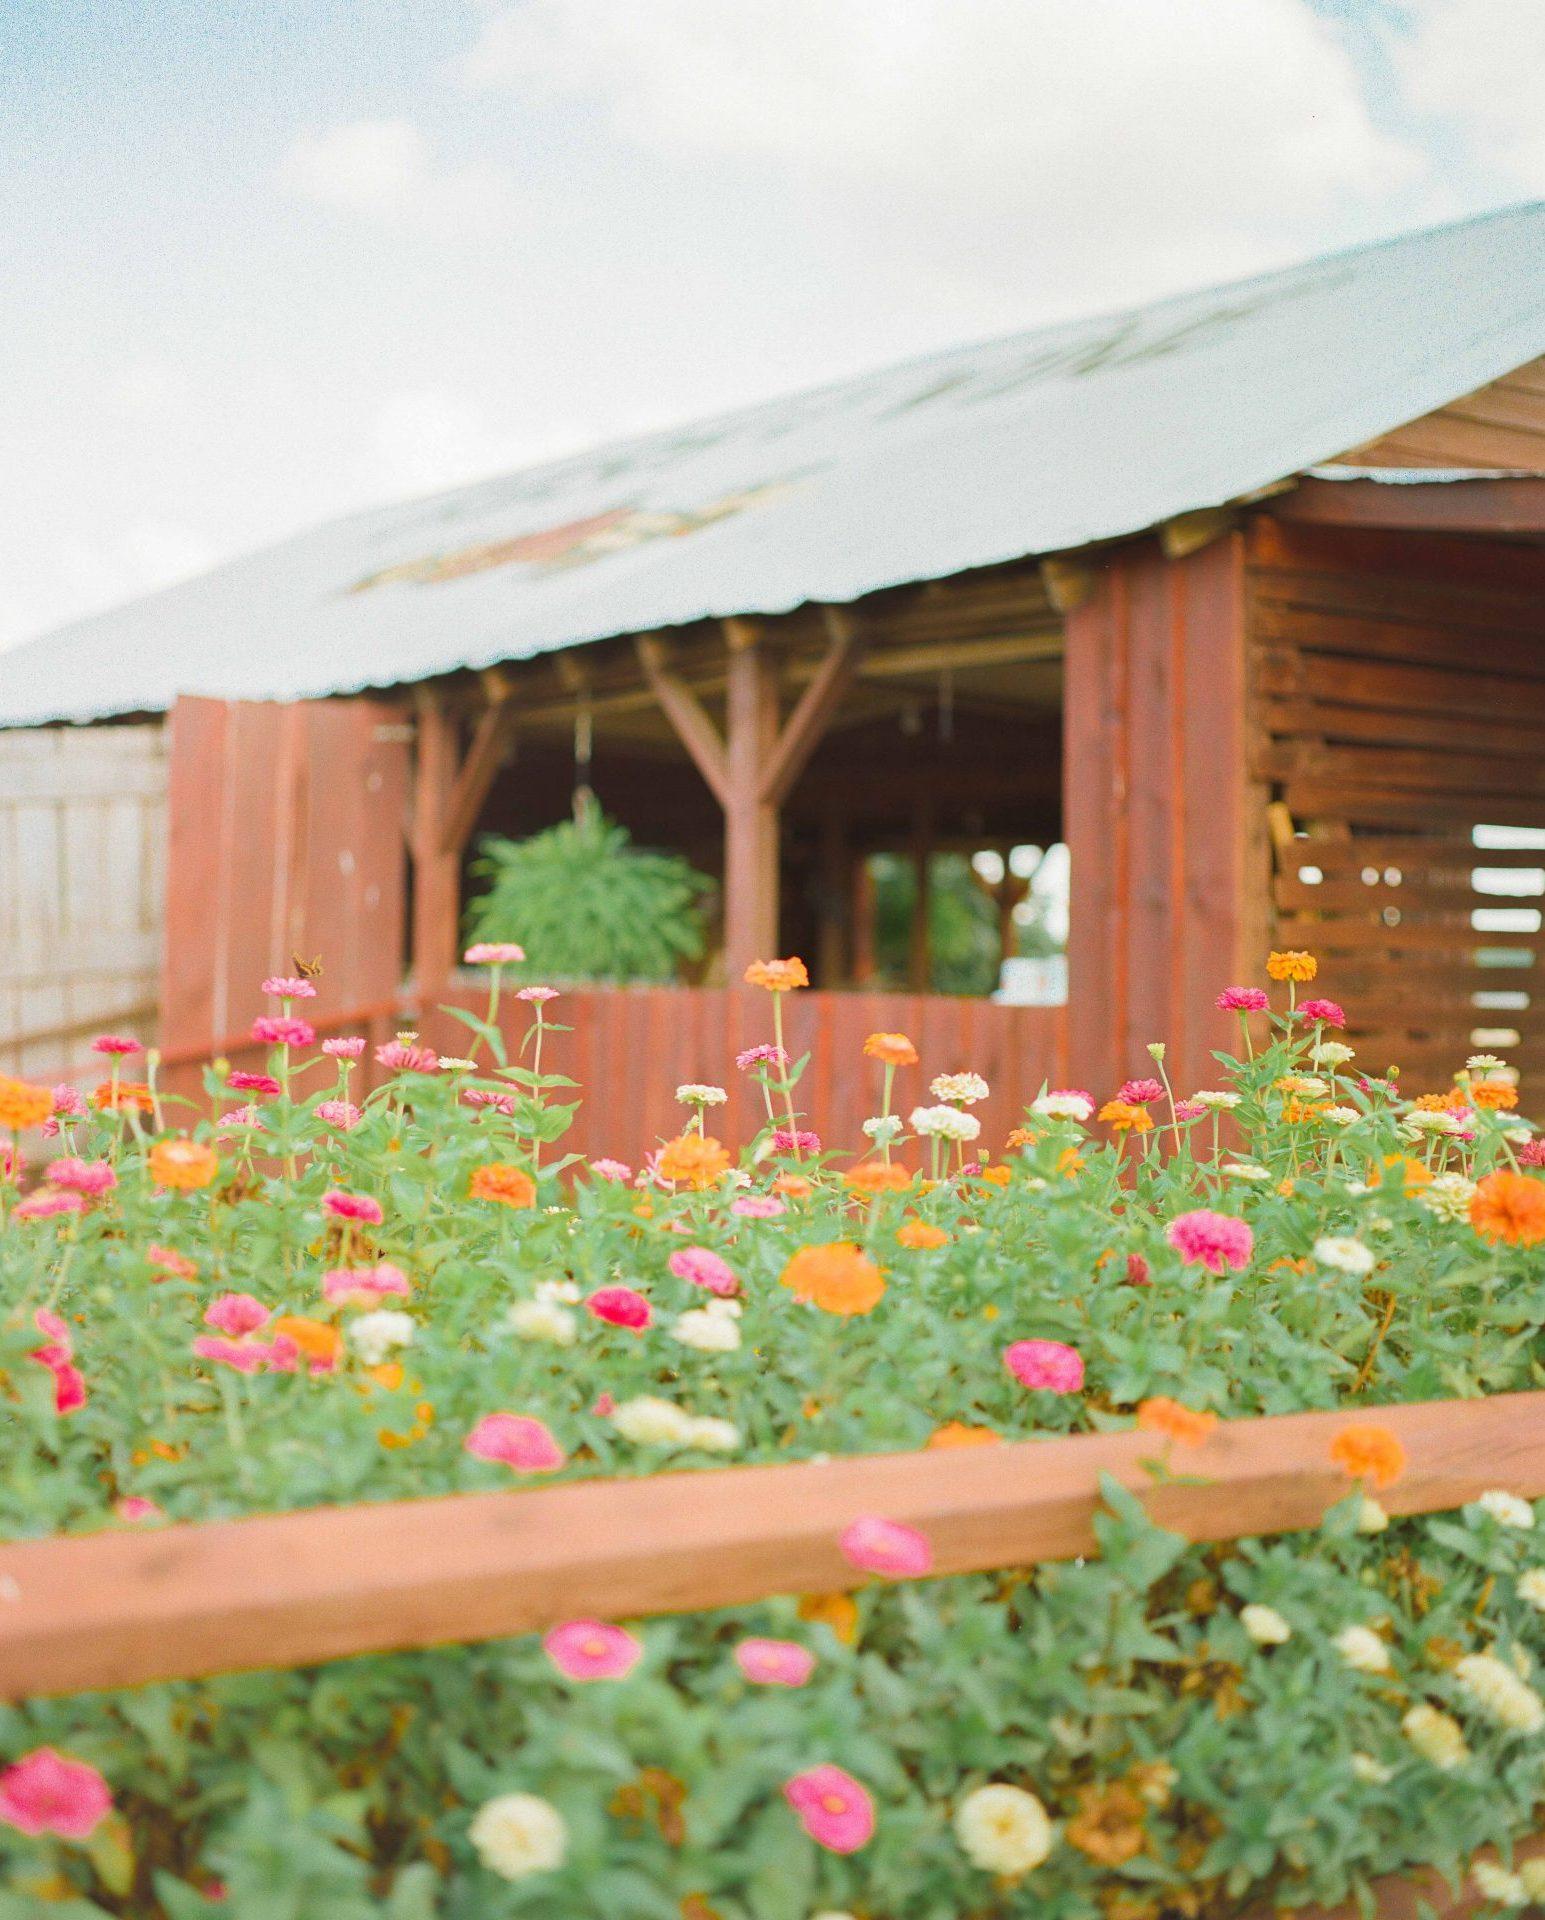 film, Pentax 6x7, bush n vine, york South Carolina, York county, fort mill, York, peaches, zinnias, farm, film photography, barn, peach stand